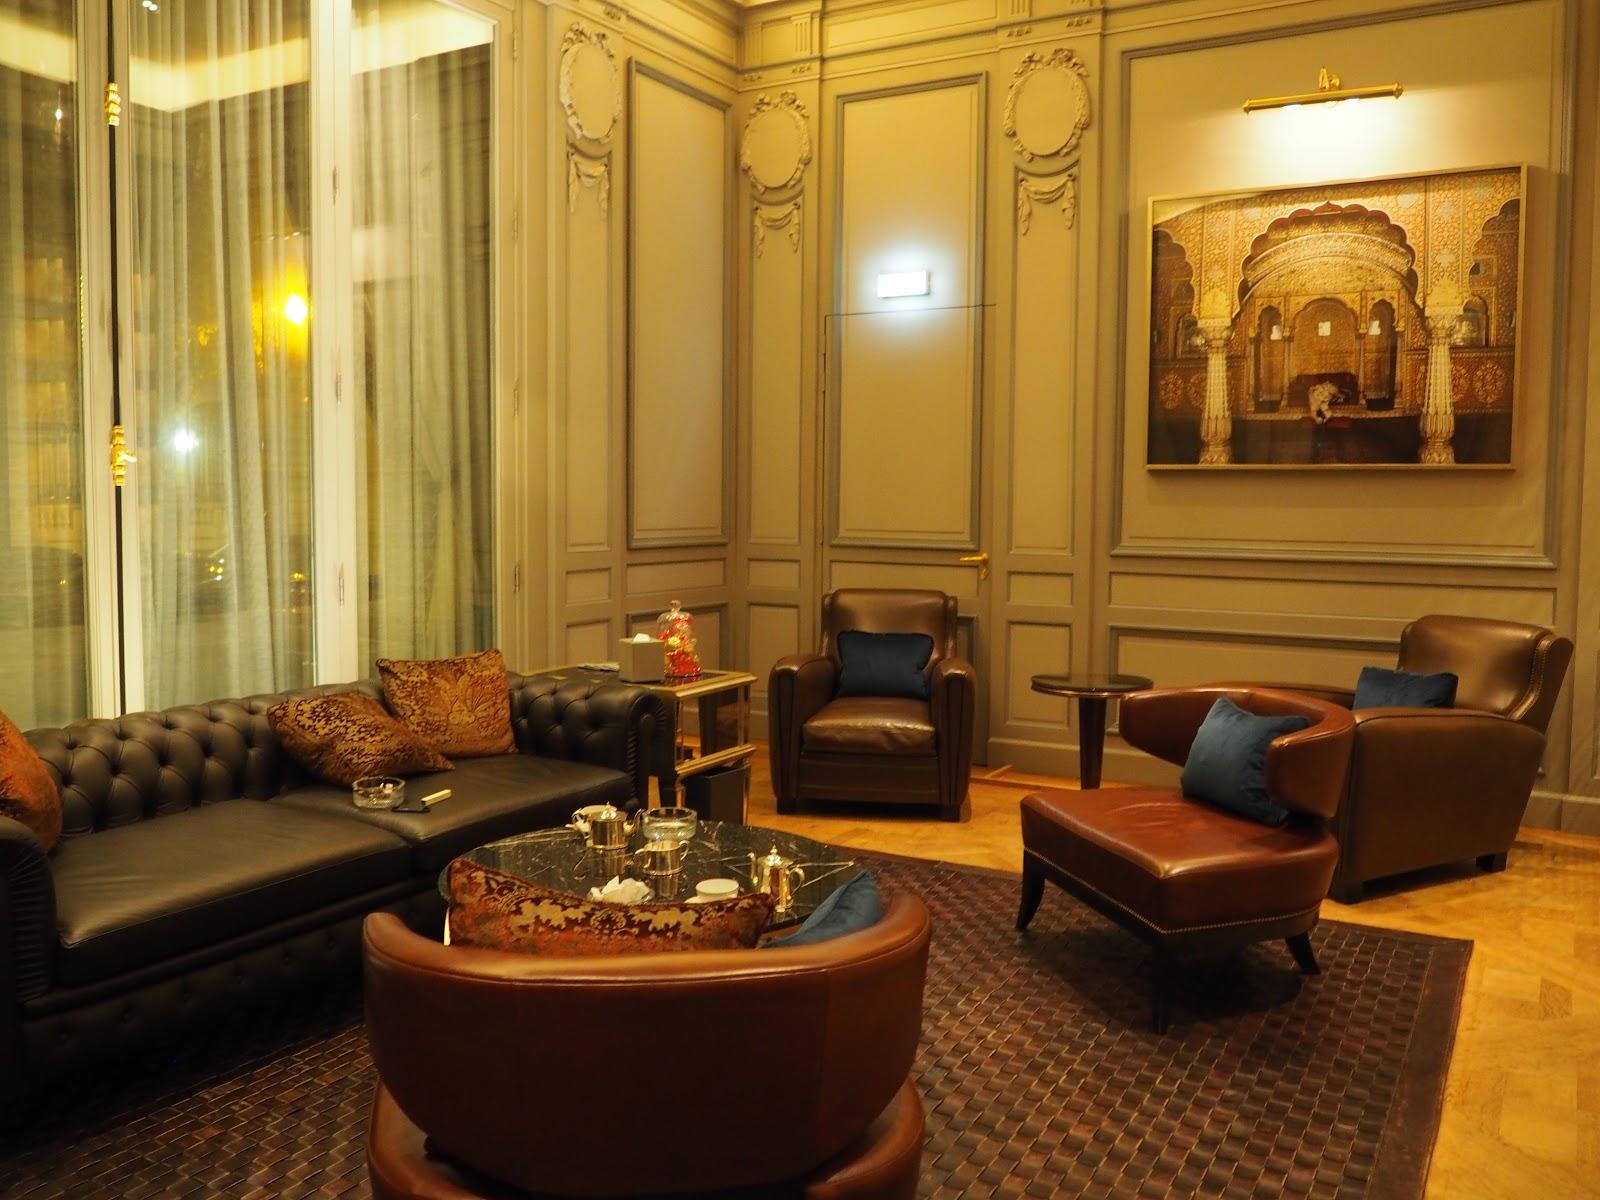 Peninsula Hotel, Paris, Cigar and Whiskey room